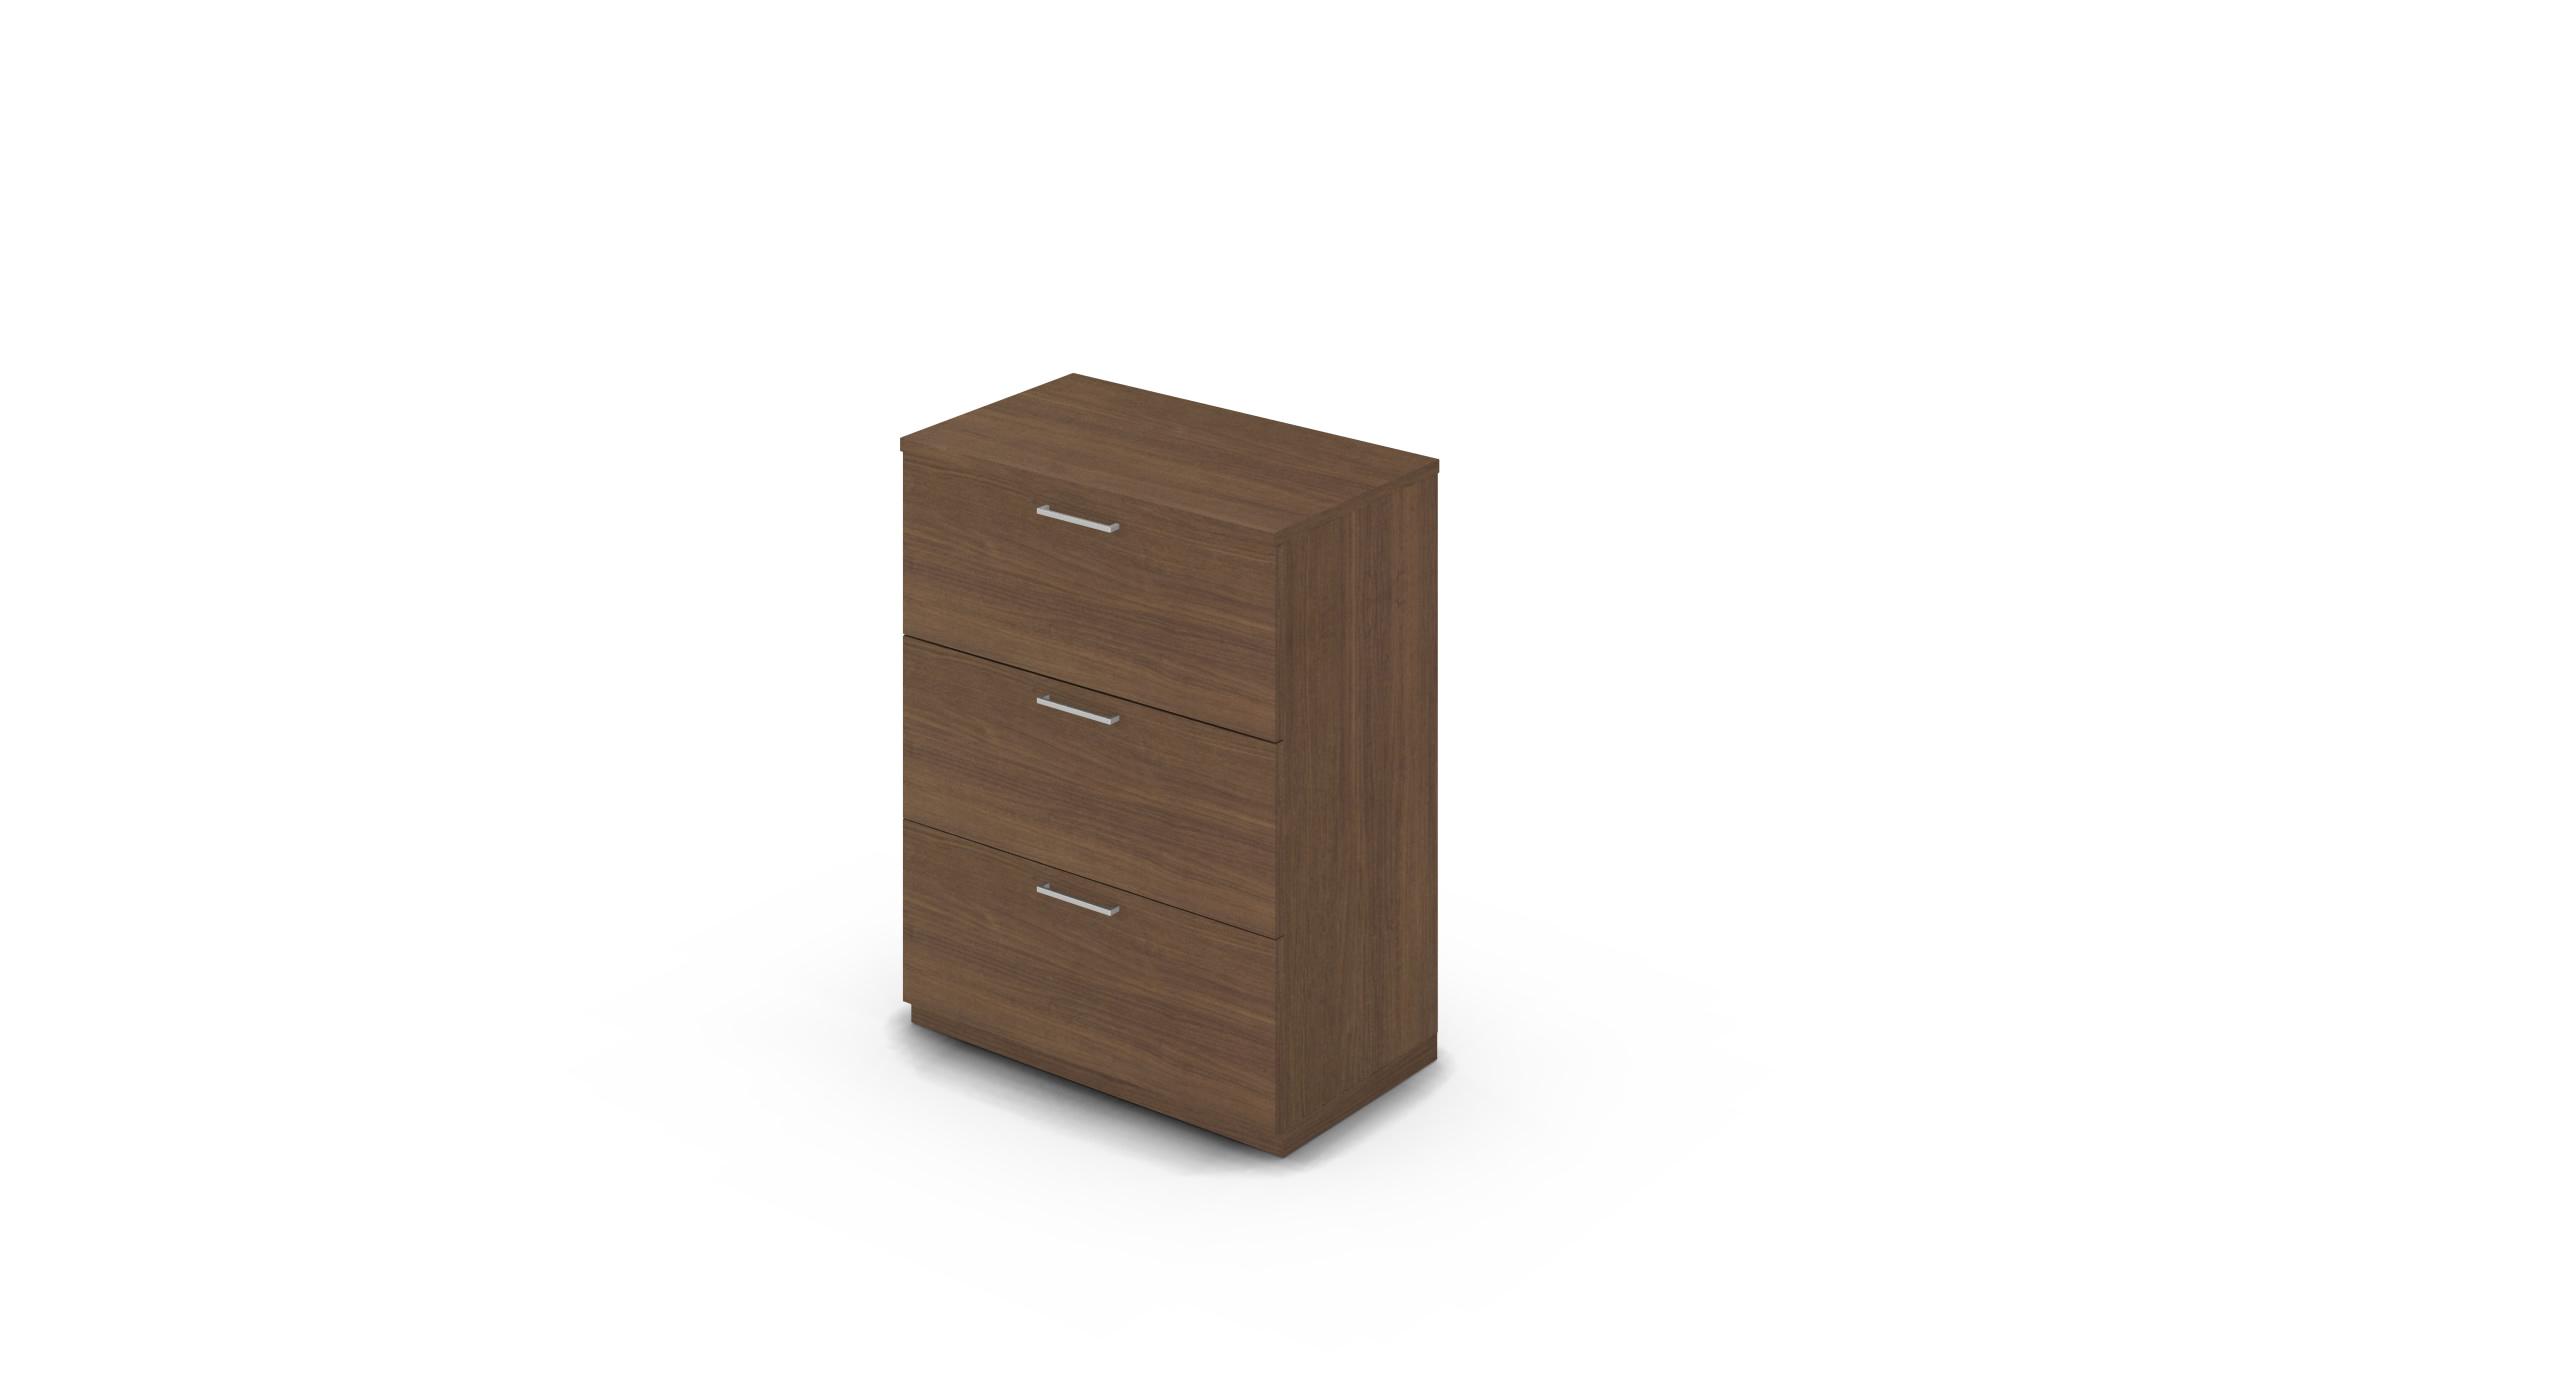 Cabinet_800x450x1125_DR_Walnut_Bar_Square_NoCylinder